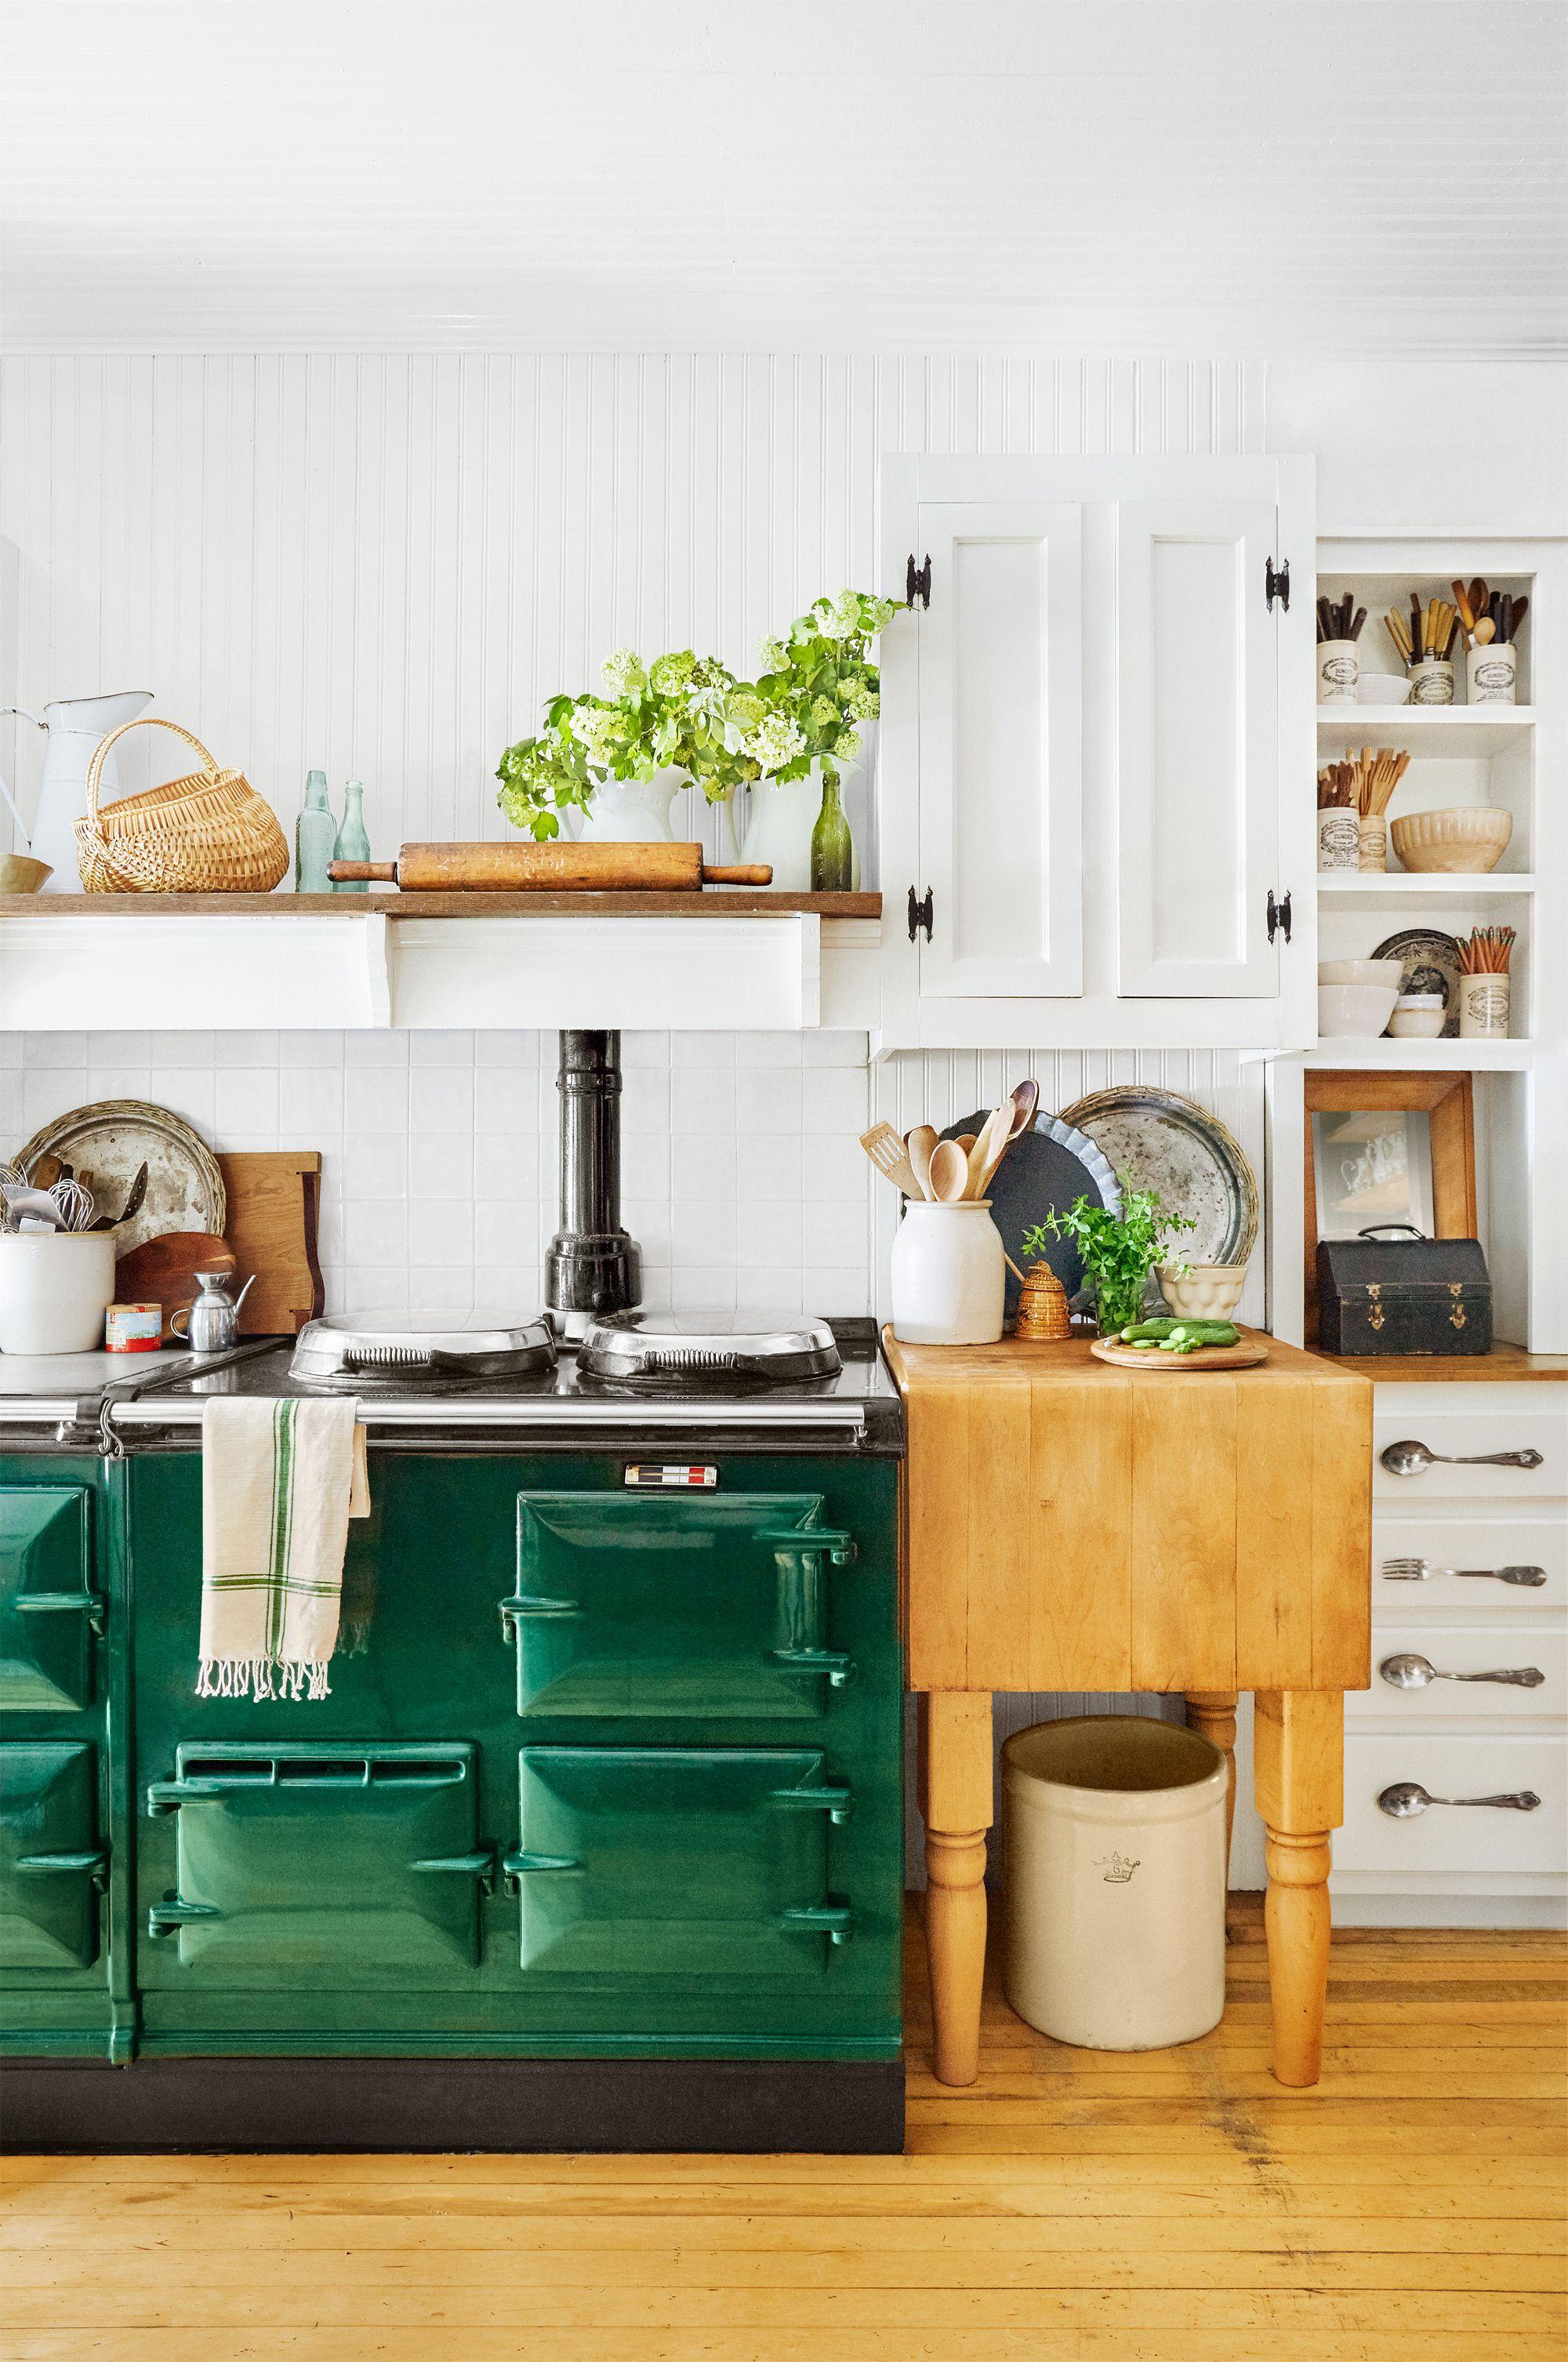 24 Farmhouse Style Kitchens - Rustic Decor Ideas for Kitchens